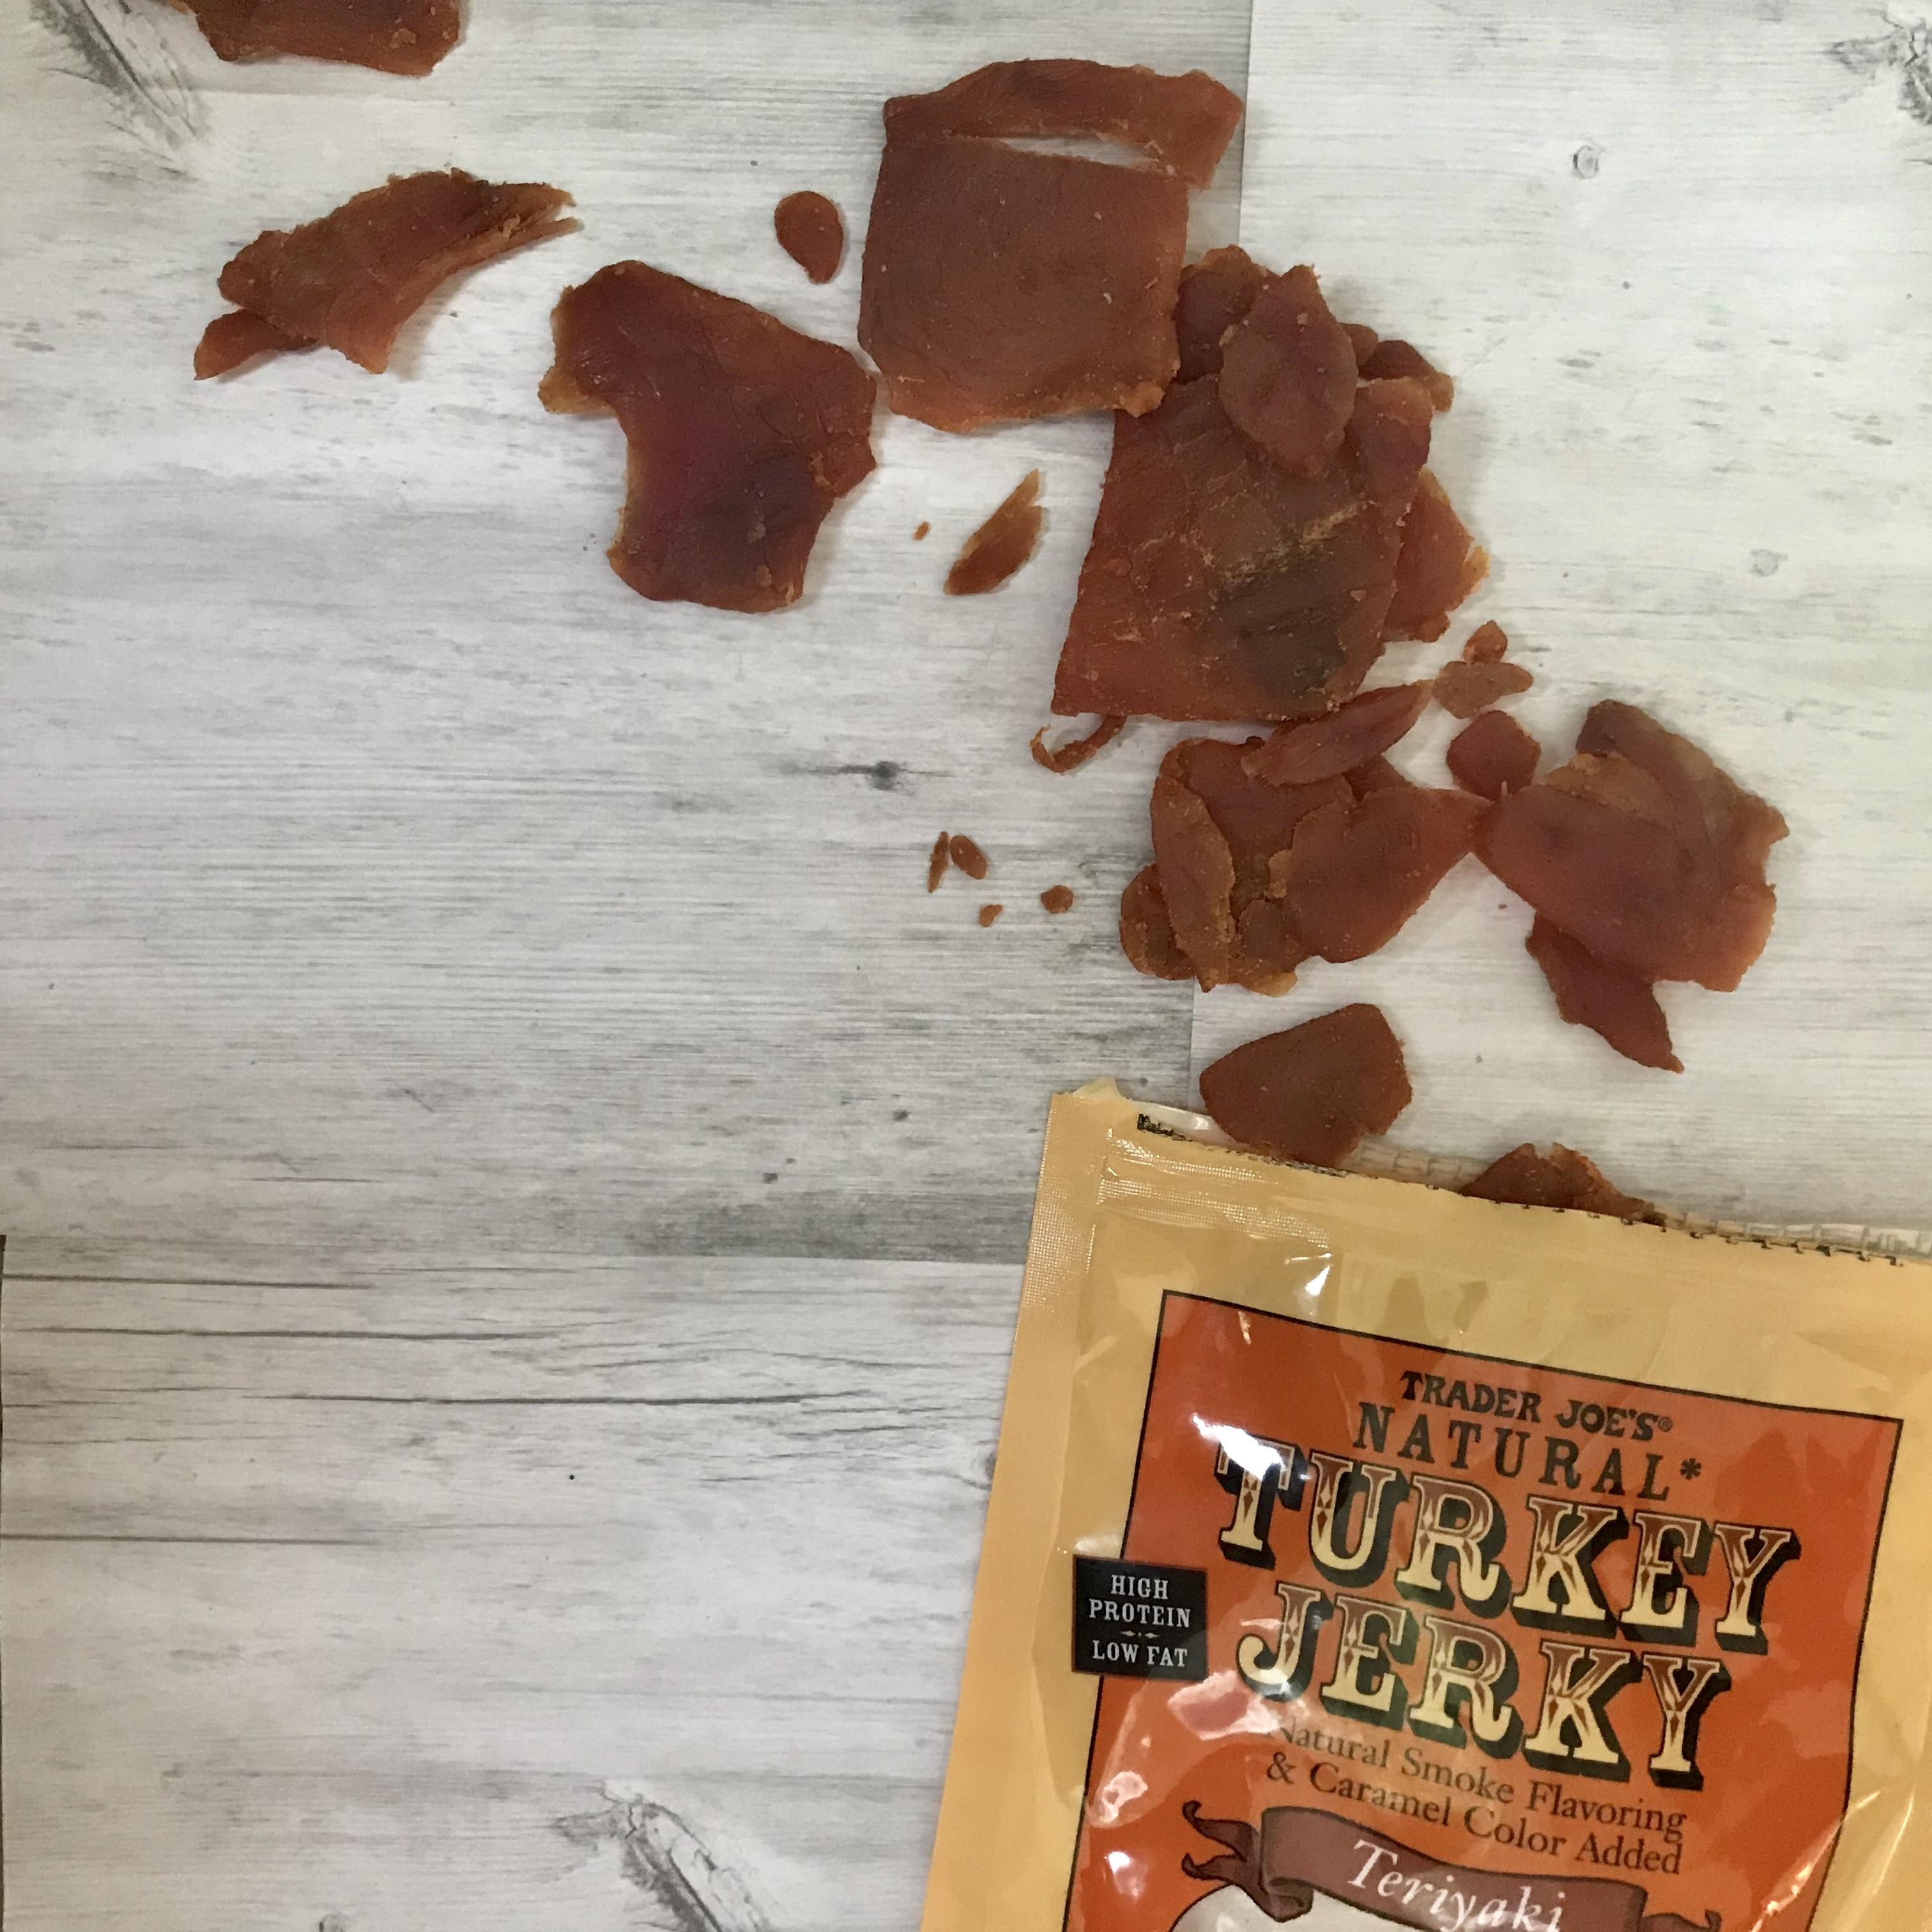 trader joe's teriyaki turkey jerky, turkey jerky, hiking snacks